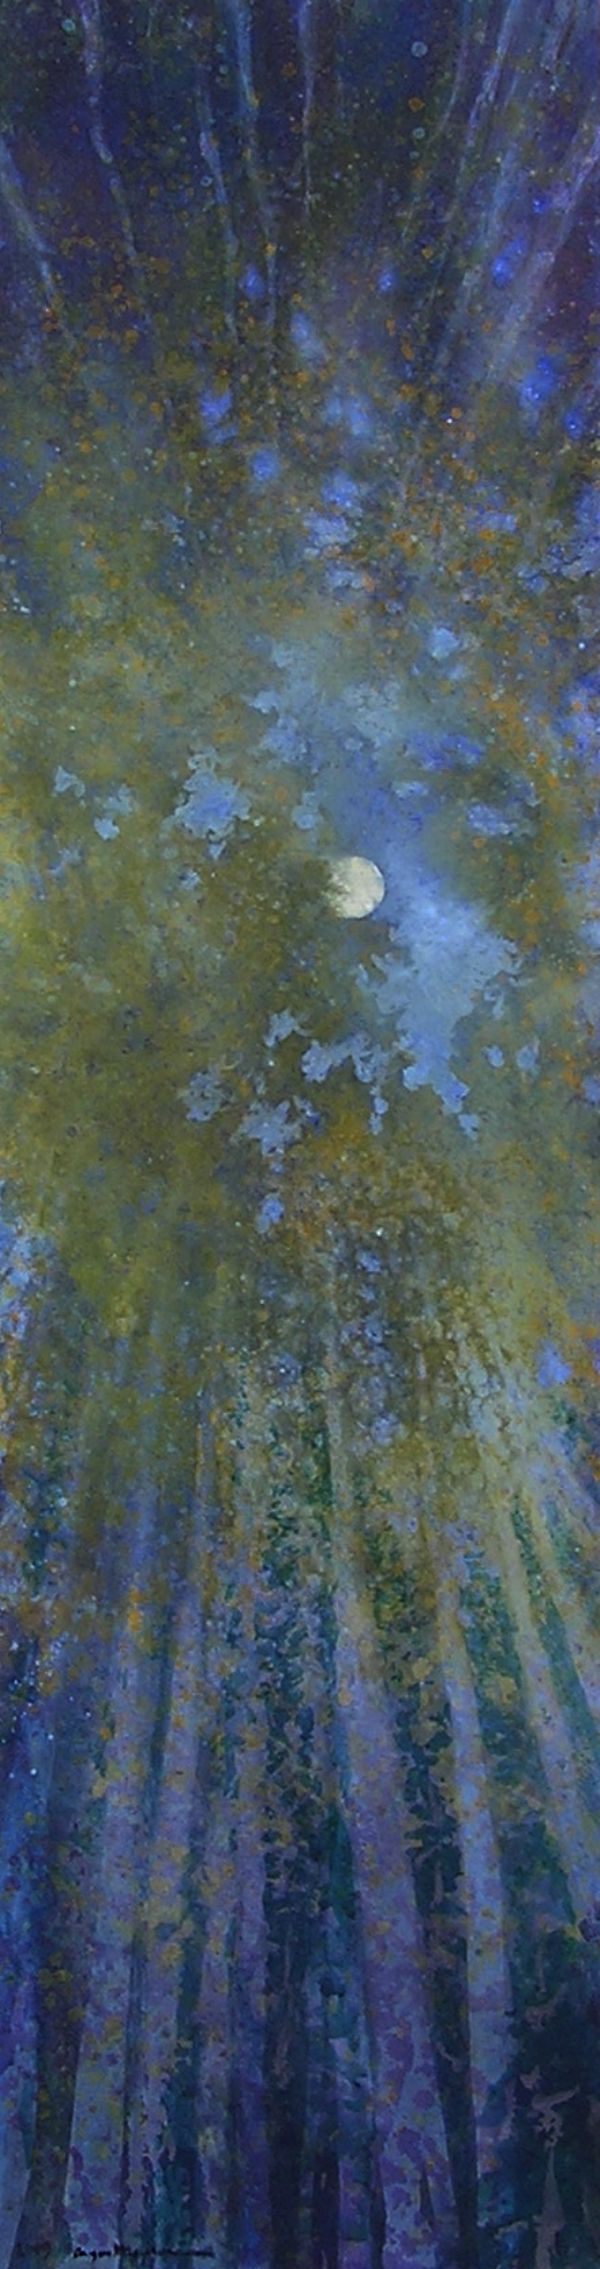 Aspen Crown Moon by Angus MacphersonArt Nature, Crowns Moon, Aspen Crowns, Art Stars Moon Painting, Nature Watercolors Painting, Aspen Tree Paintings, Aquarelle Painting Abstract, Angus Macpherson, Aspen Painting